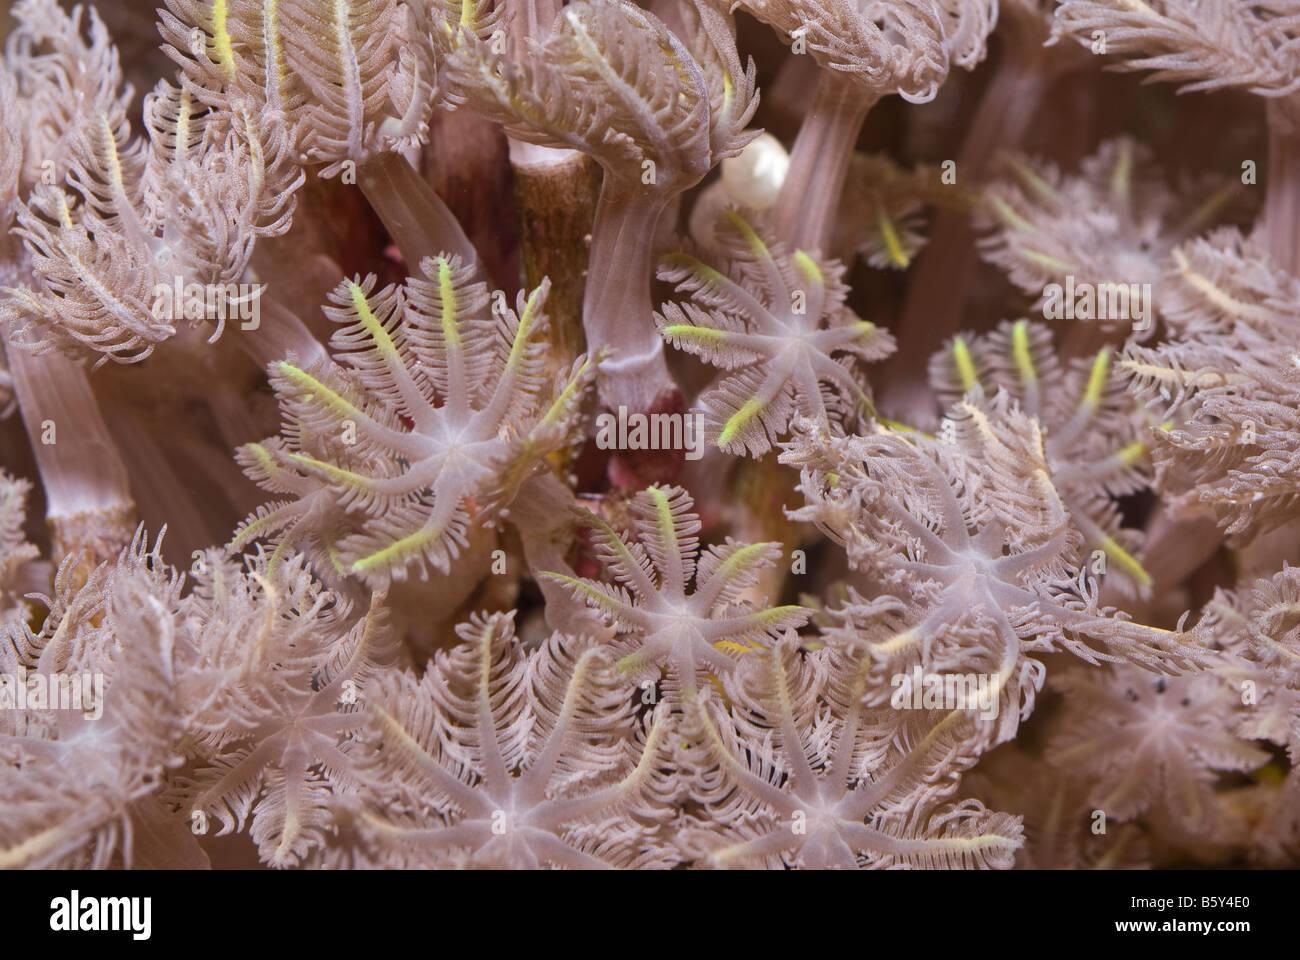 Soft coral Cespitularia sp., reef invertebrates of Indo-pacific ocean - Stock Image